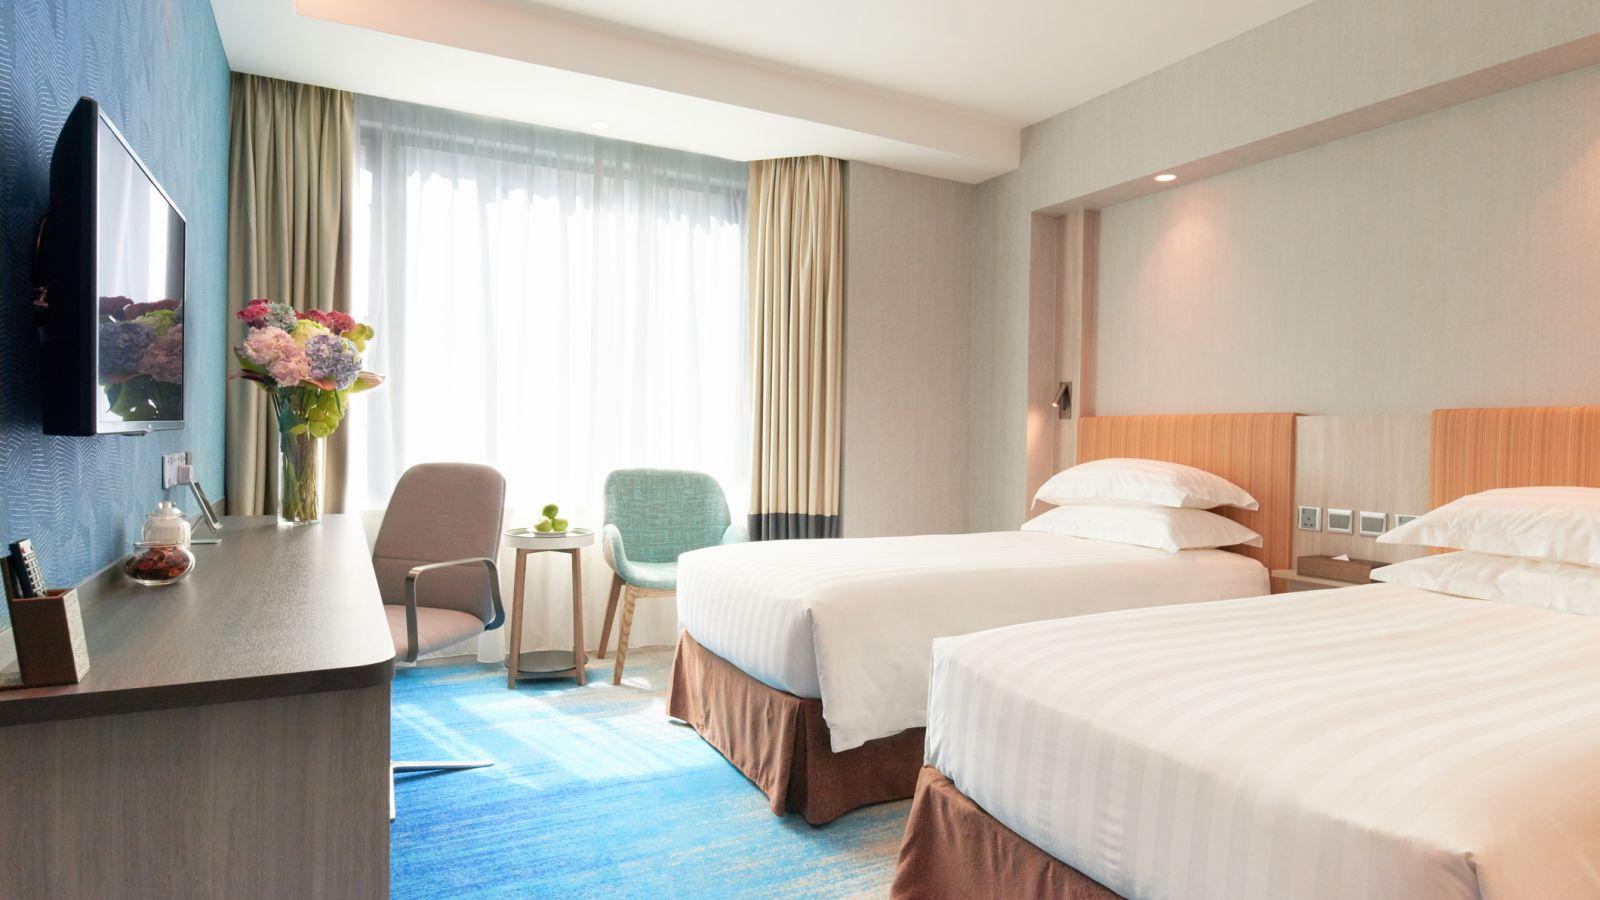 hotel Sheung wan Mtr